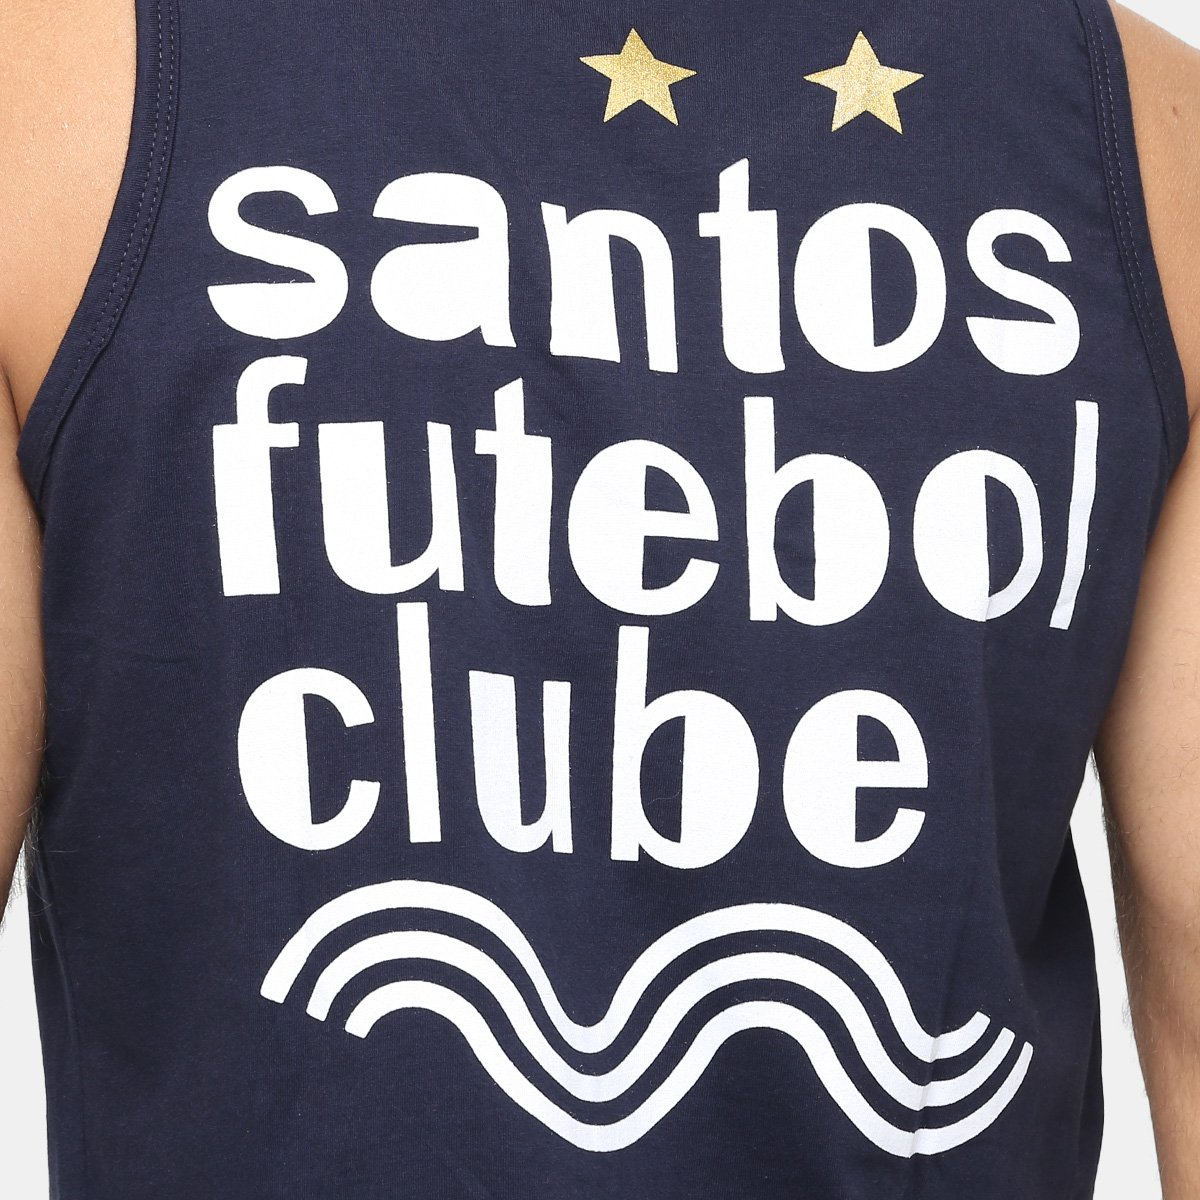 Camiseta Regata Santos Futebol Clube II Masculina - Marinho - Compre ... 8812f8971bbc2